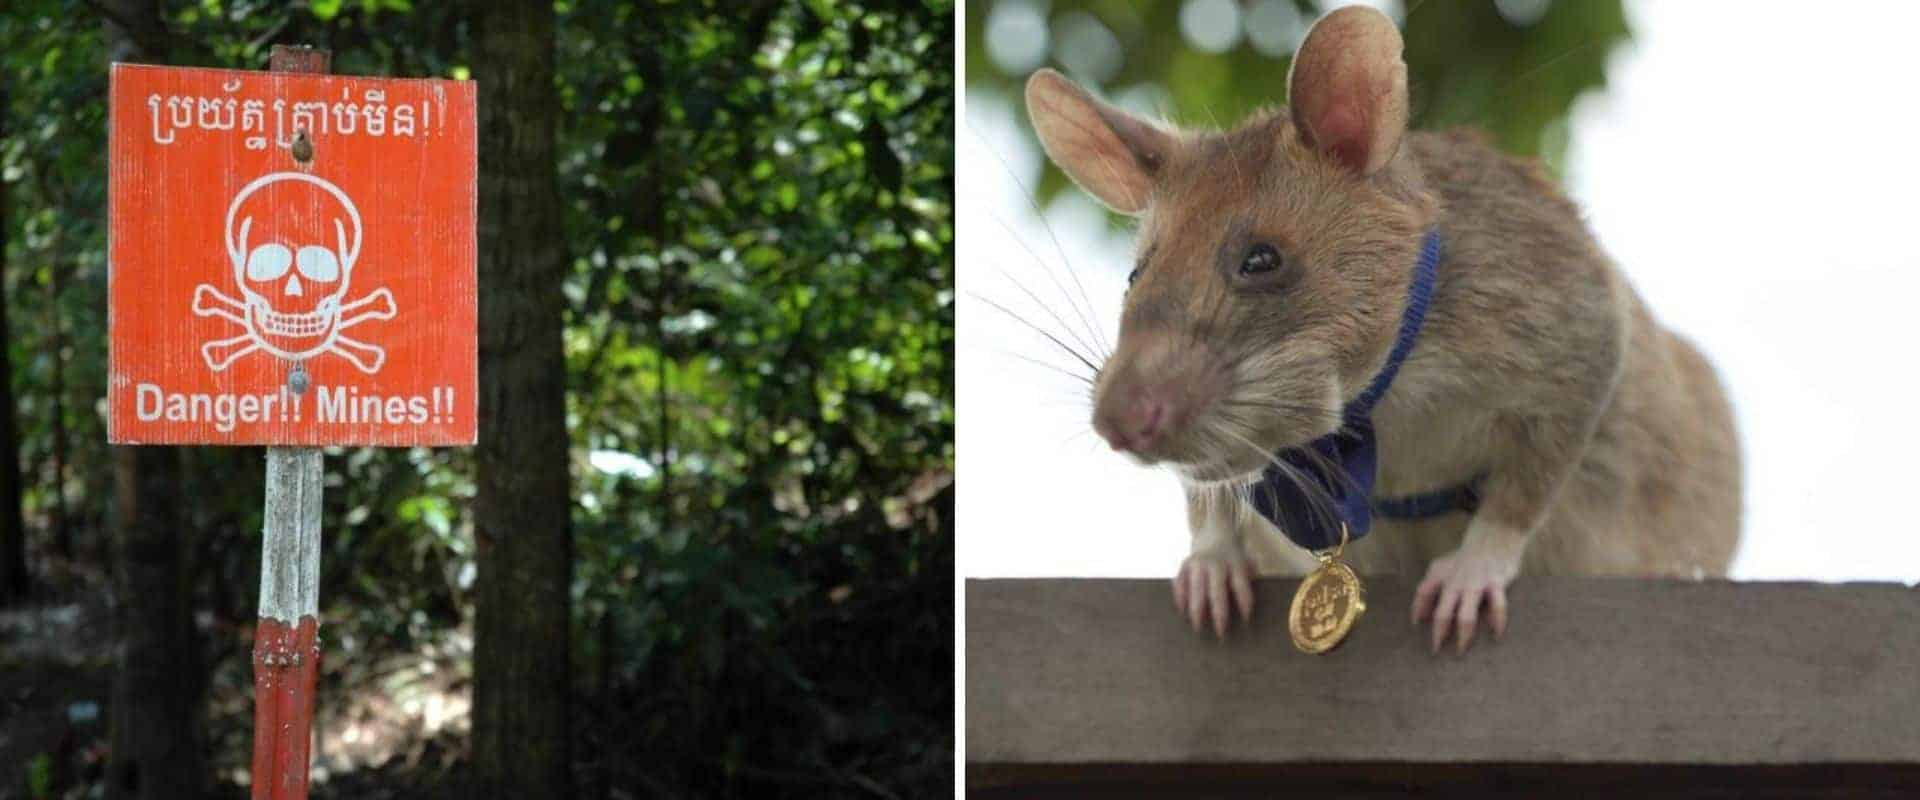 Se retira la rata que hizo historia detectando minas terrestres en Camboya